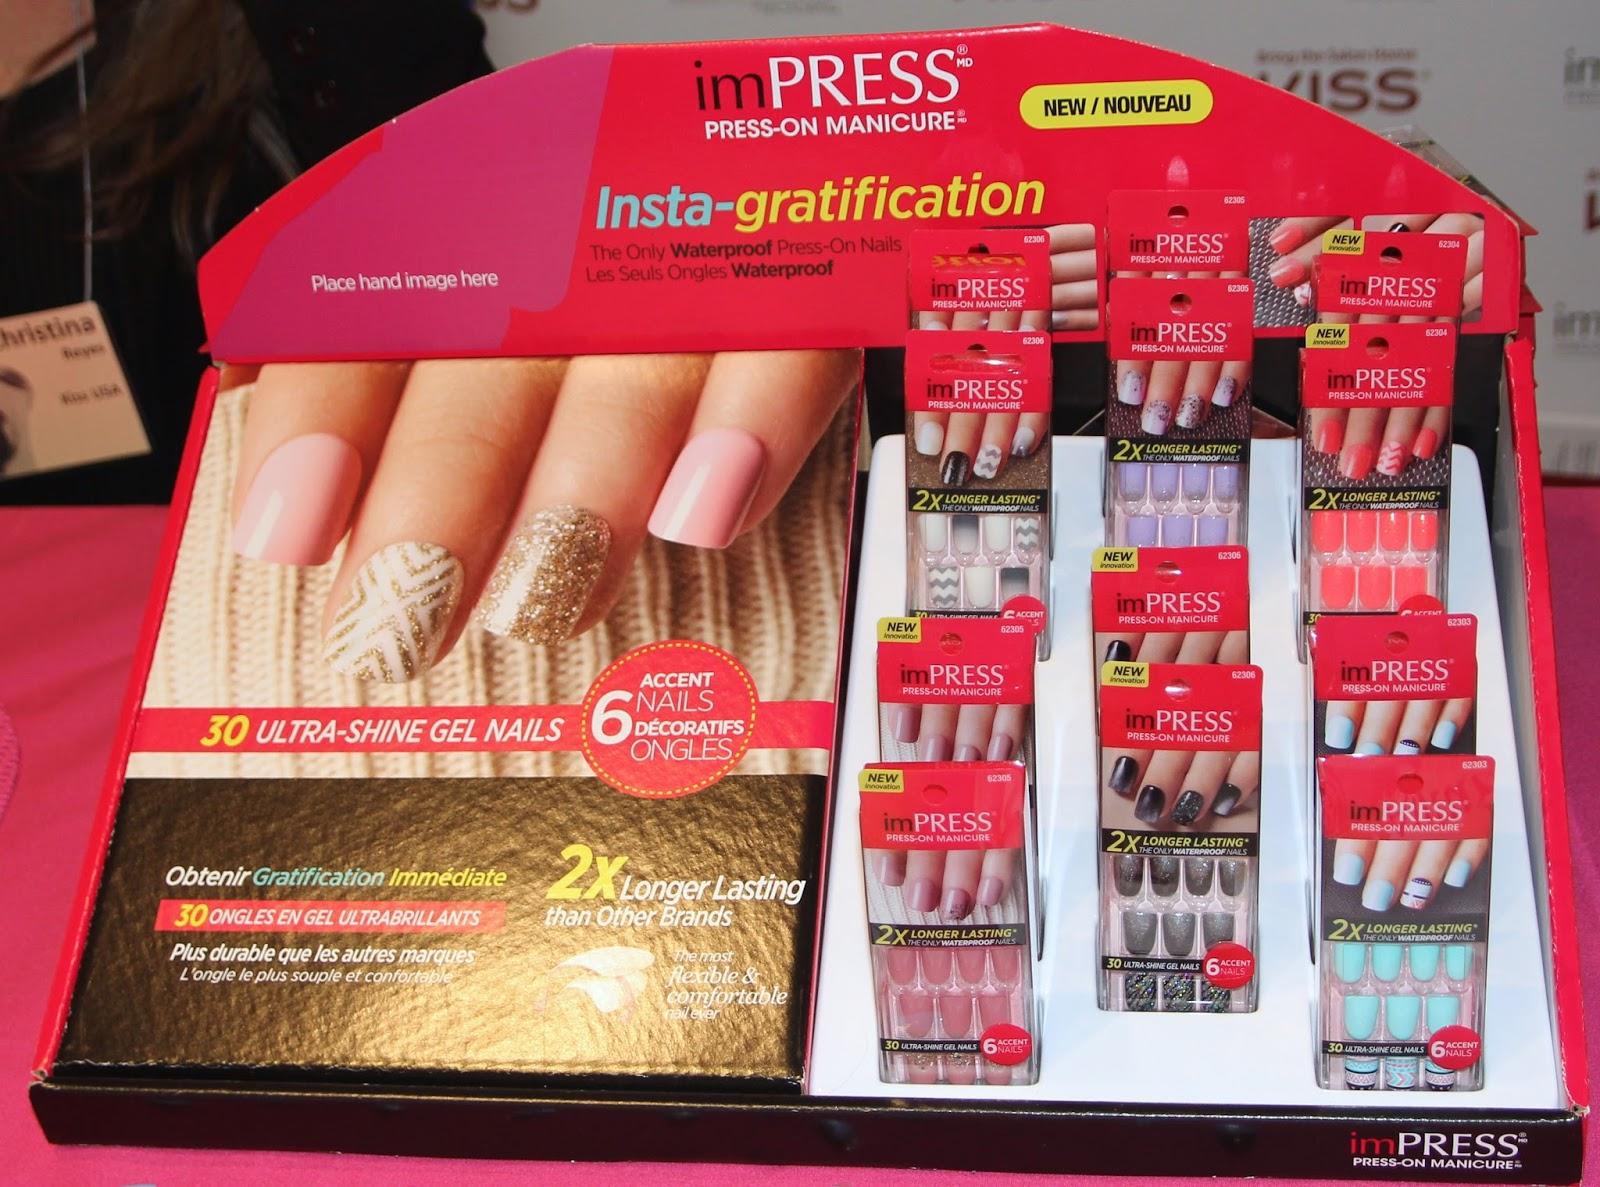 Hapamanda\'s Beauty Blog: How To: Apply imPRESS Gel Manicure Nails!